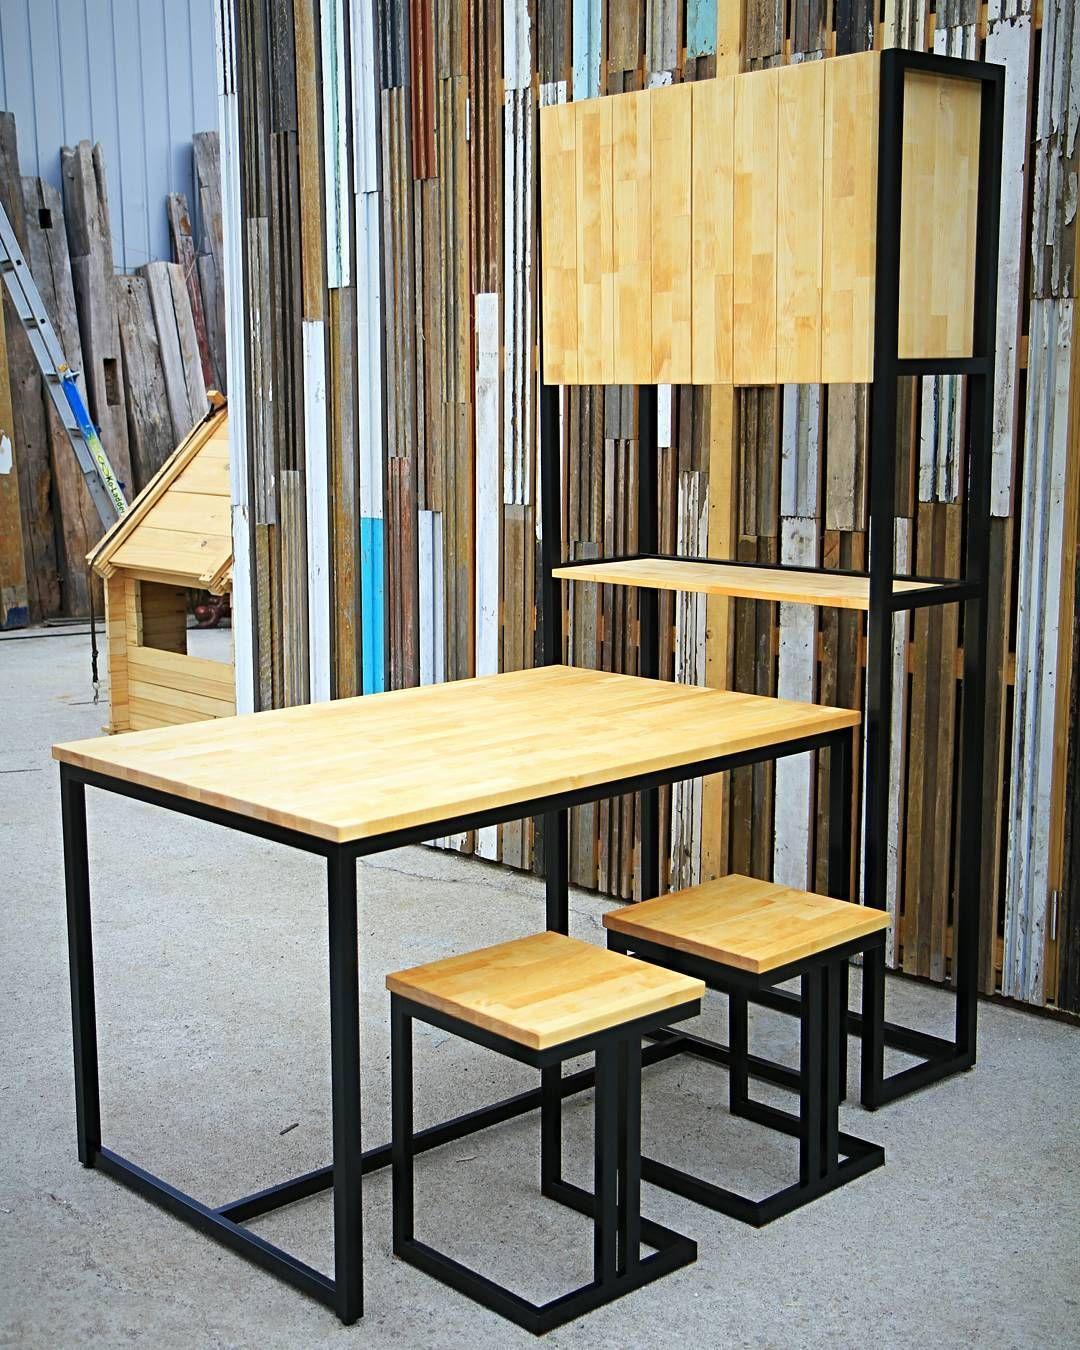 [ The Storage 101 ] w/European White Birch by Ramith Design  The combination of Birch finished w/Natural Oil & Satin Black Steel Frame.  >>> NOW ON SALE!!! <<<   유럽산 백자작으로 제작된 개별 사용이 가능한 수납선반과 테이블 그리고 스툴셋트  밀어넣어 '공간절약형 23인용 테이블'로 사용하거나 꺼내어 '46인용 테이블'로 사용 가능   2016 코엑스 리빙디자인페어 진열상품 파격가 판매중!!! (구입문의는 010.4510.2563 으로)   Blog : http://ramithdg.blog.me E-mail : ramithdg@naver.com Kakao : Ramith  #라미스디자인 #북유럽가구 #친환경가구 #공방가구 #원목가구 #주문제작가구 #맞춤가구 #일산 #디자인가구 #디자인원목가구 #디자인원목소품 #철제수납장 #철제테이블 #철제스툴…